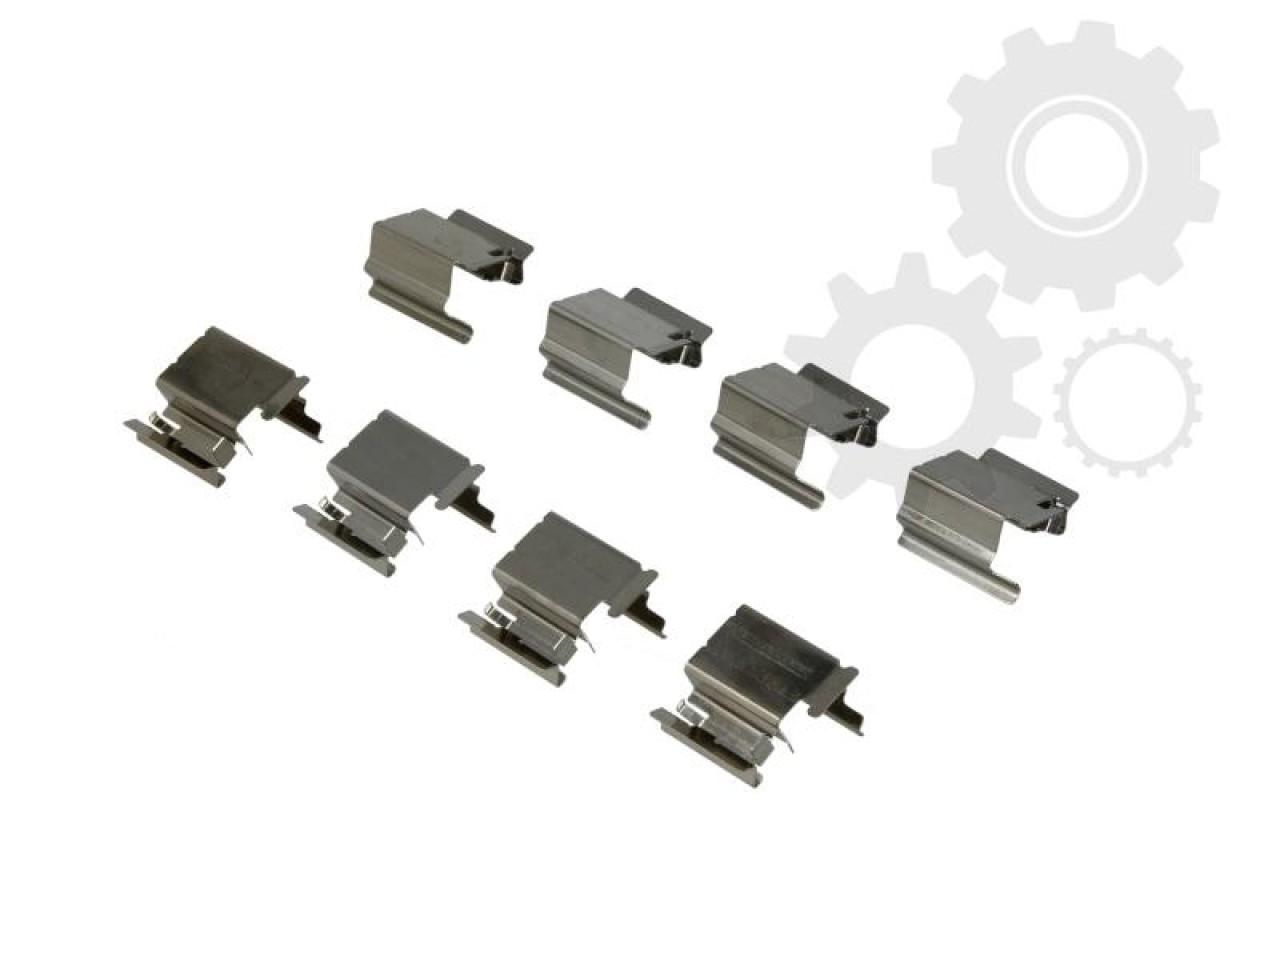 Set accesorii placute frana FORD ESCORT VI sedan GAL Producator OJD QUICK BRAKE 109-1218